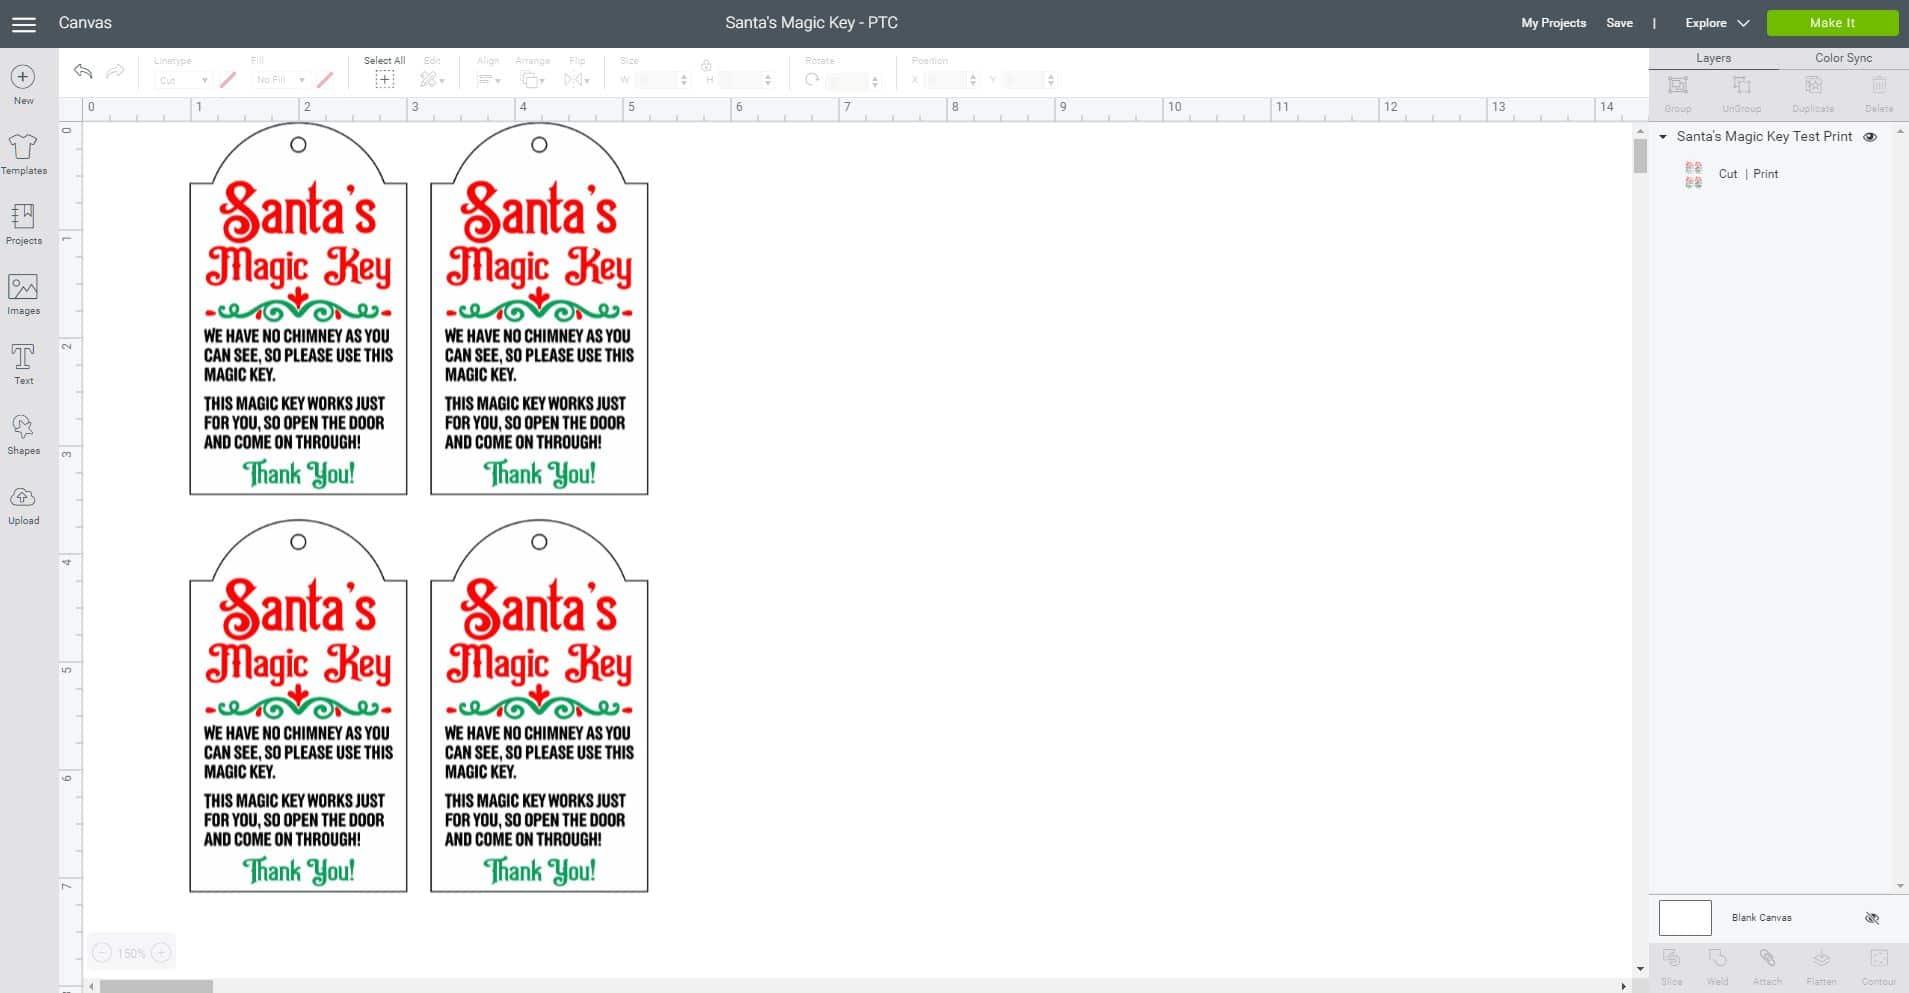 Cricut Design Space software screenshot with Santa's Magic Key Print Then Cut design